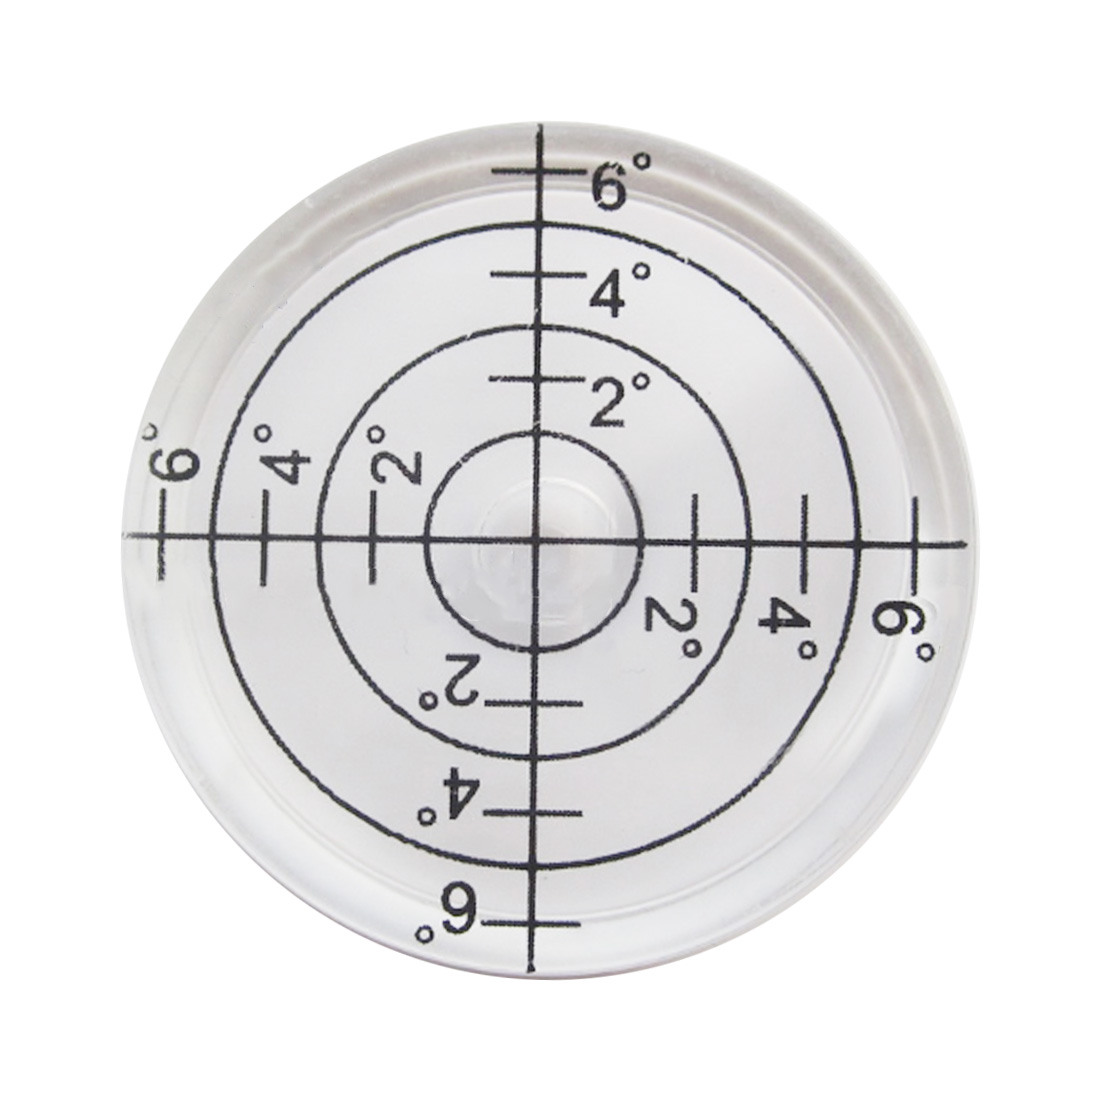 Precision Spirit Bubble Level Degree Mark Surface Round Circular Measuring Kit